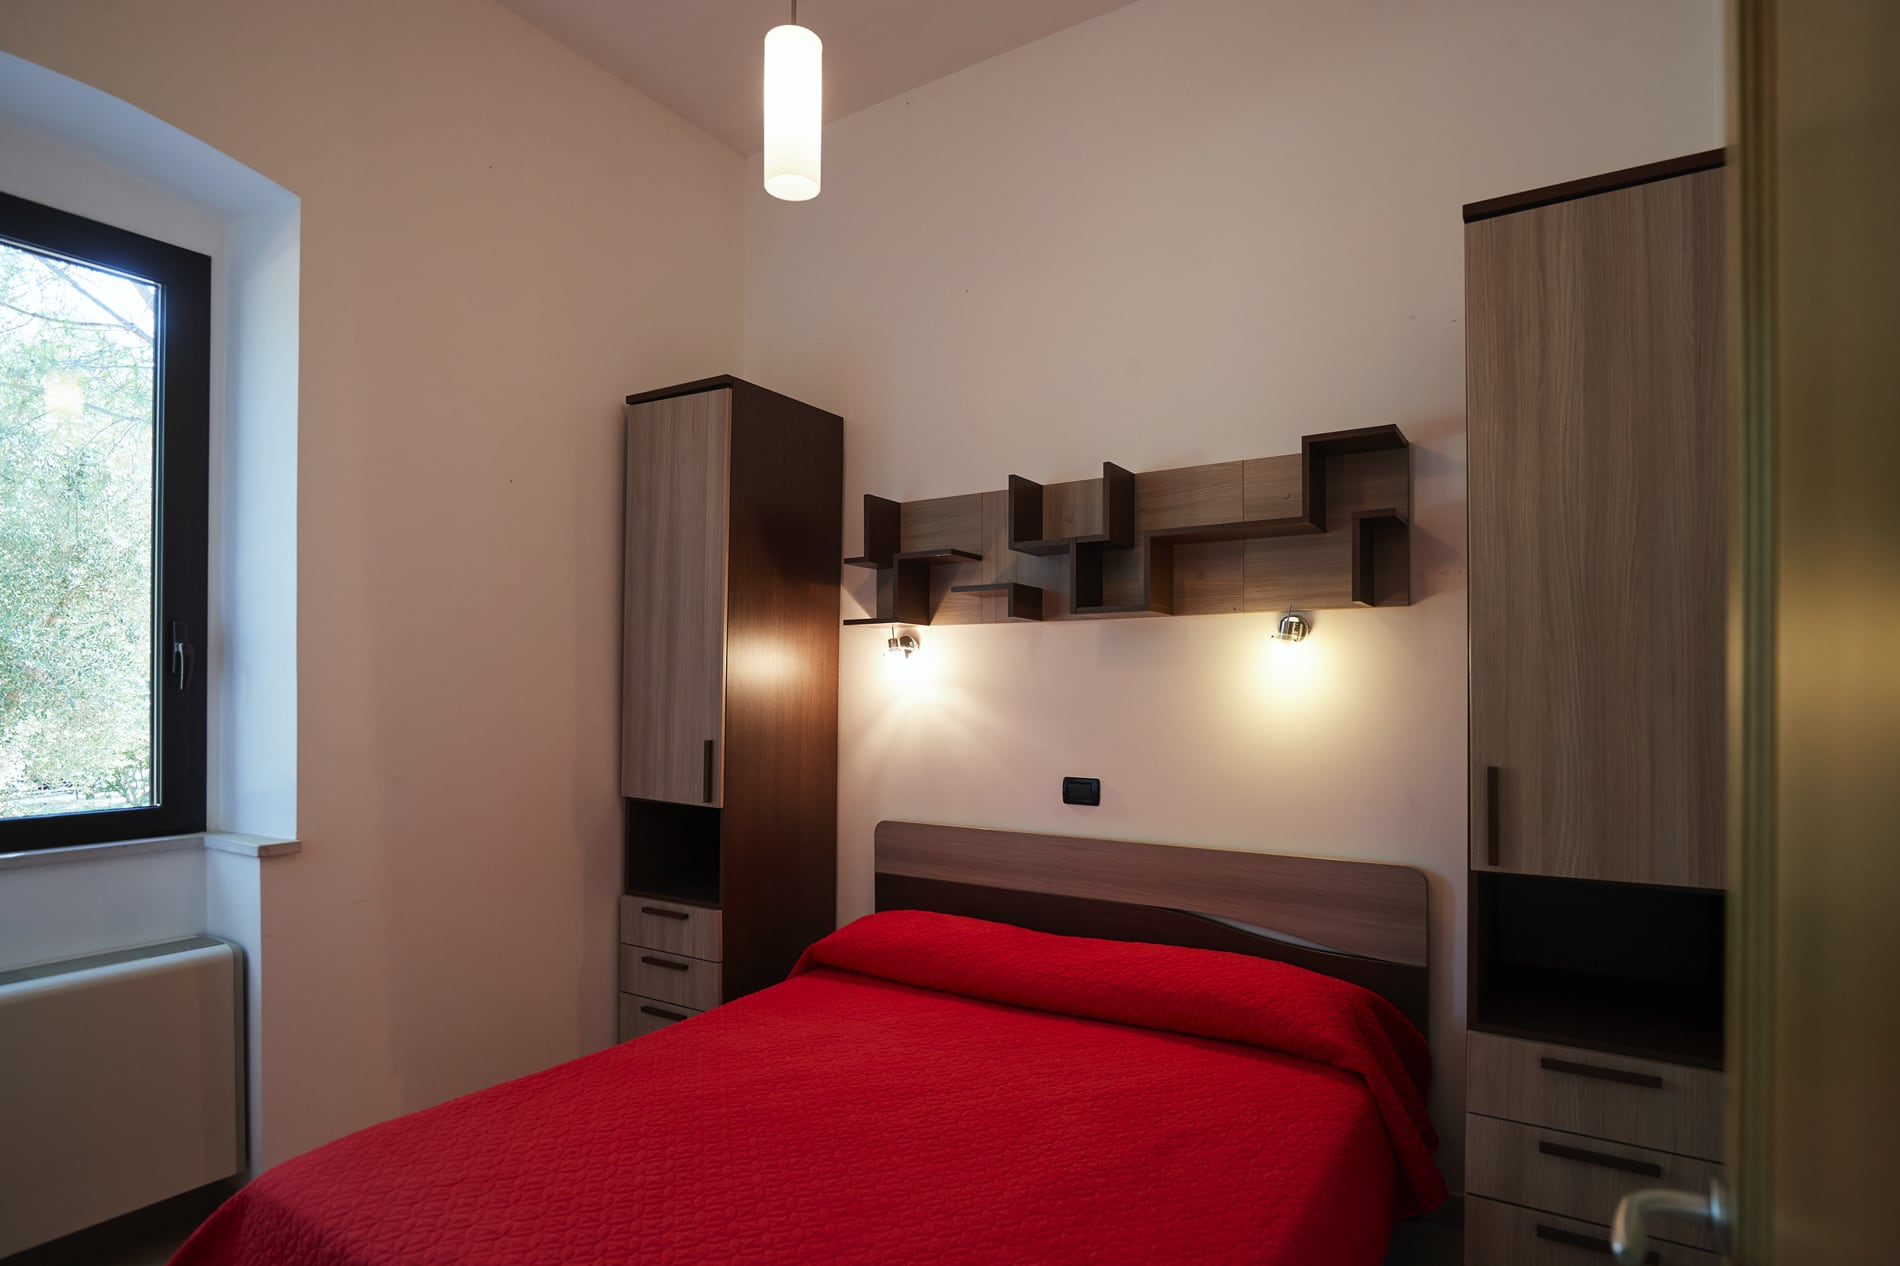 appartamenti large8I3443